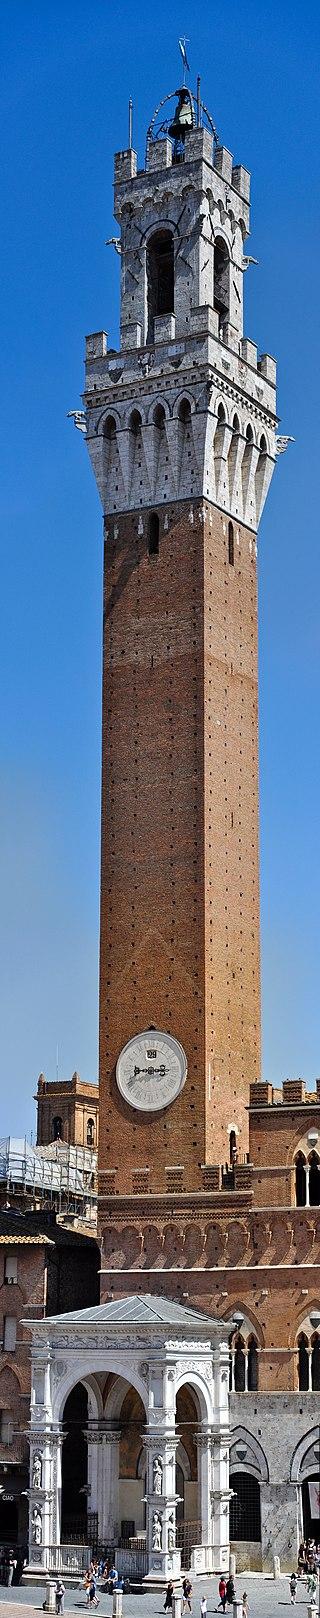 320px-Torre_Palazzo_Pubblico_Siena.jpg